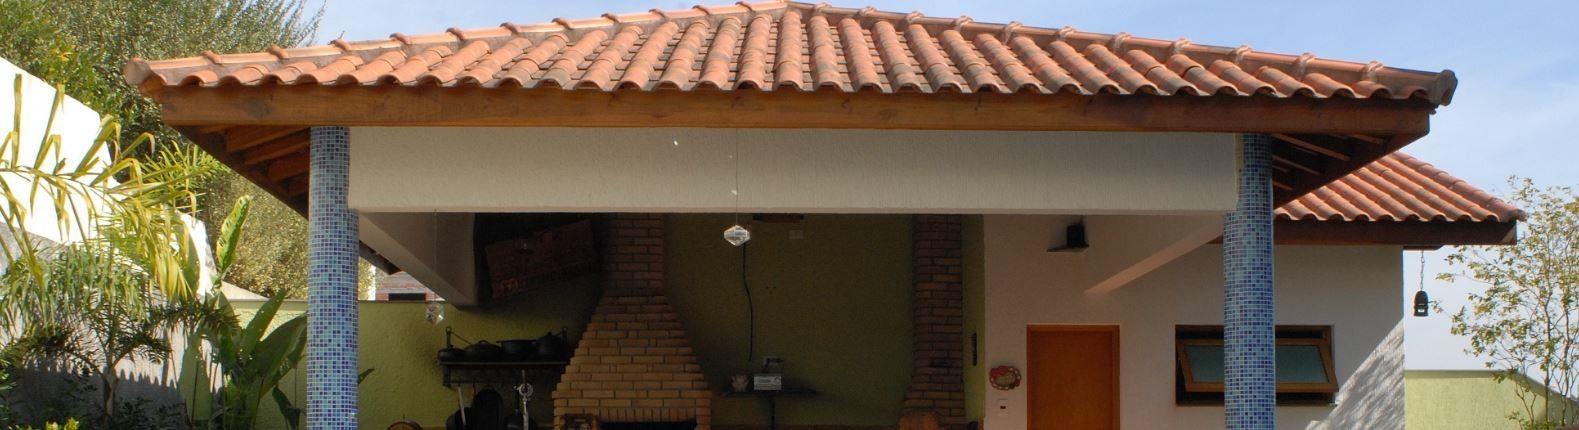 ferja-arquitetura-construcao-de-casas-e-estruturas